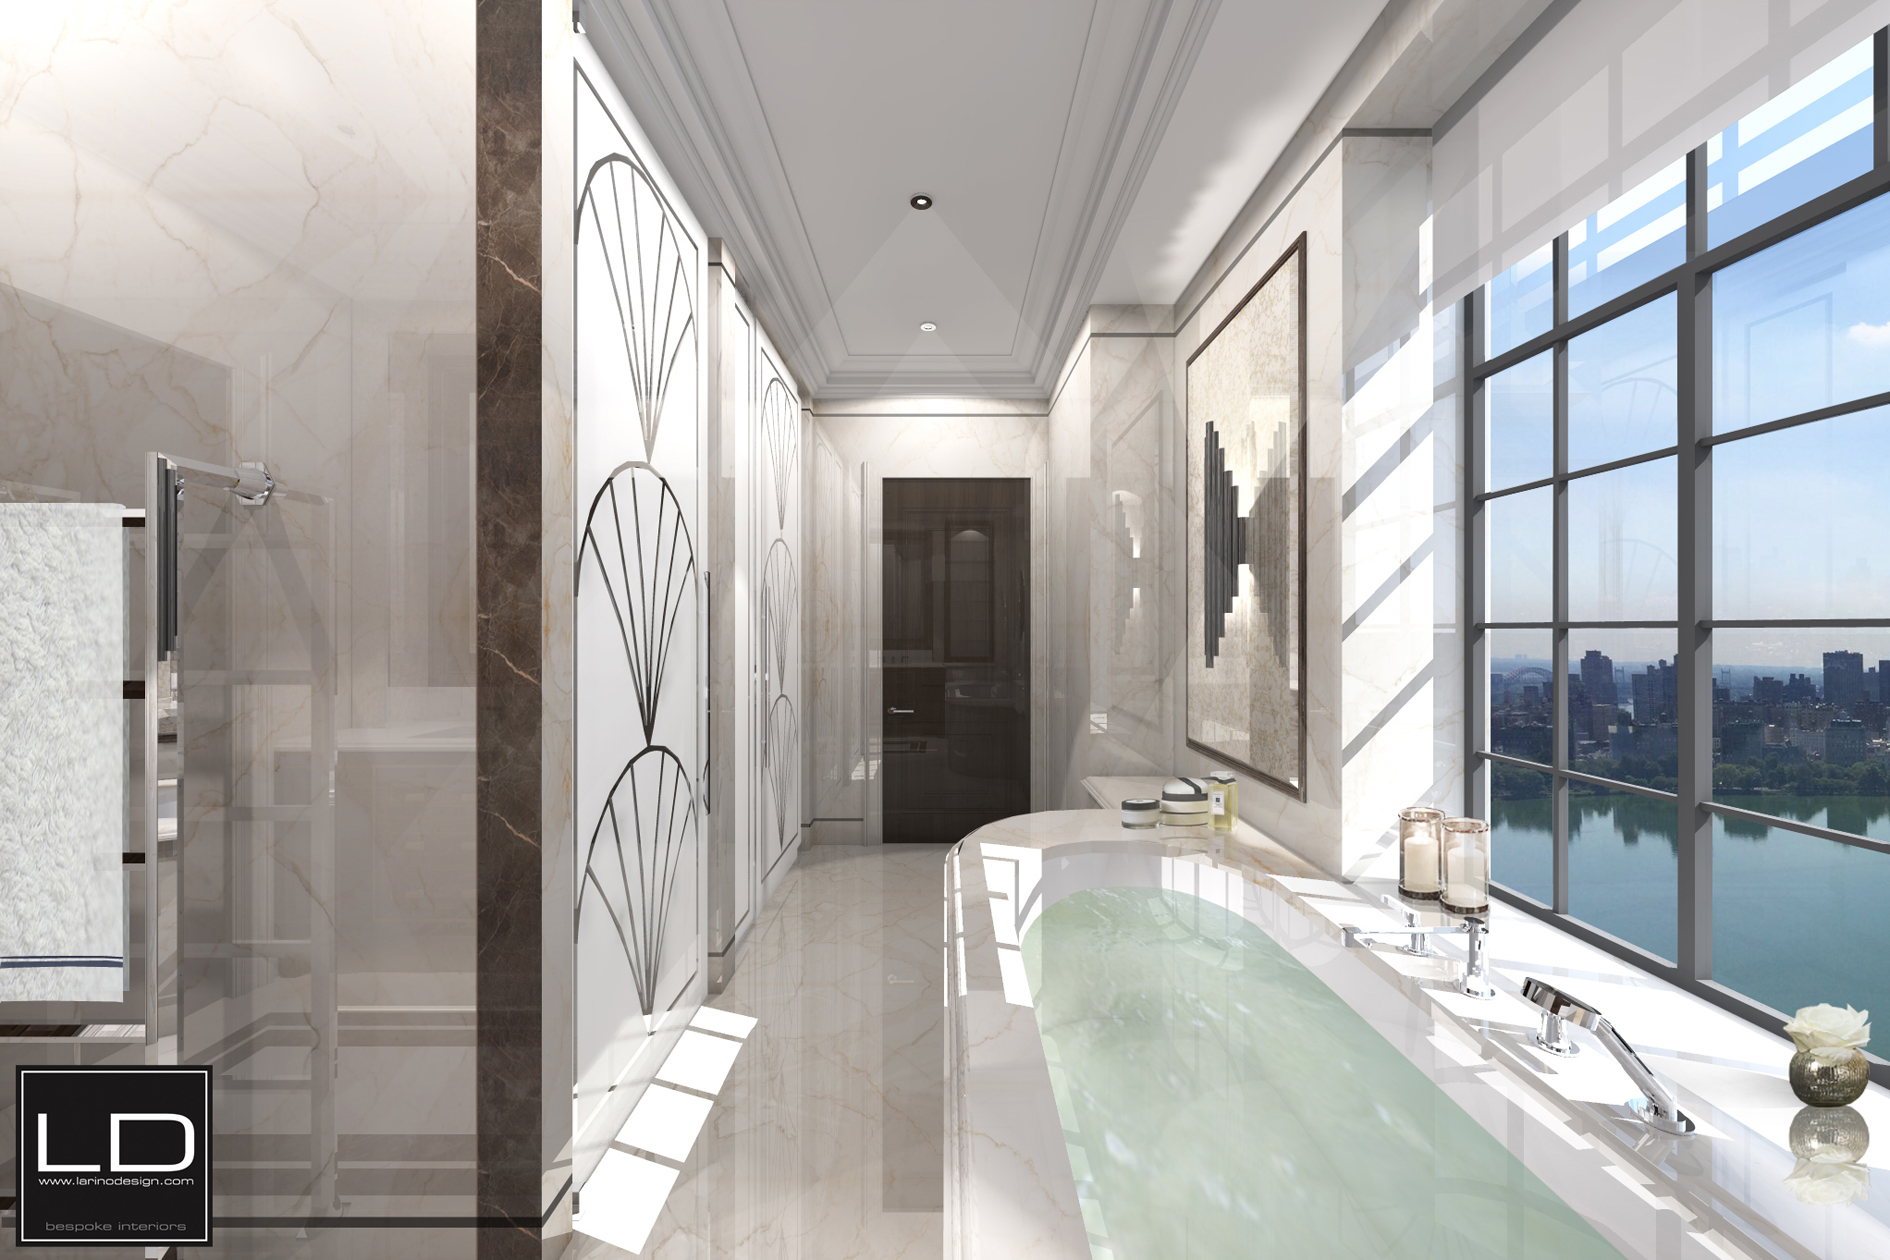 300 MASTER BATH VIEW 3.jpg